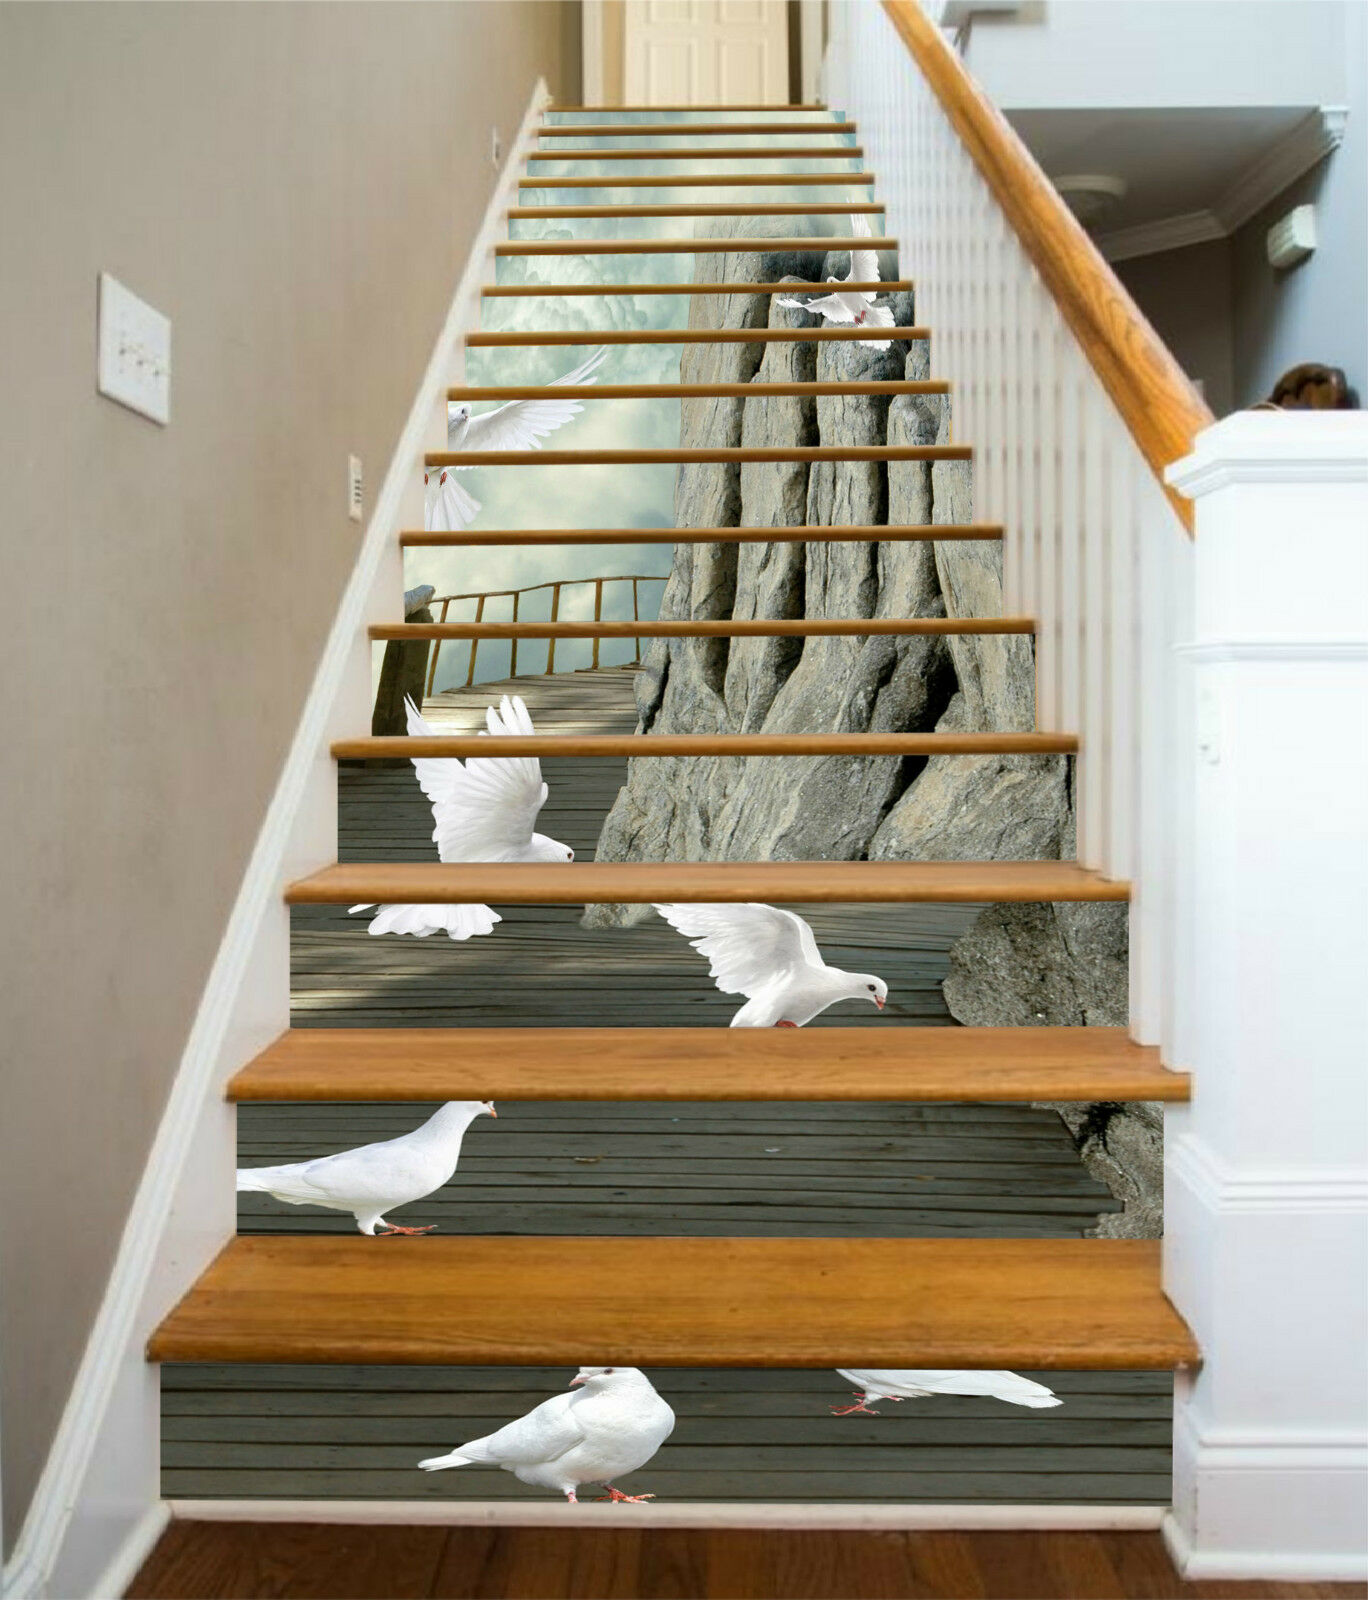 3D Fliegen Vogel 38 Stair Risers Dekoration Fototapete Vinyl Aufkleber Tapete DE